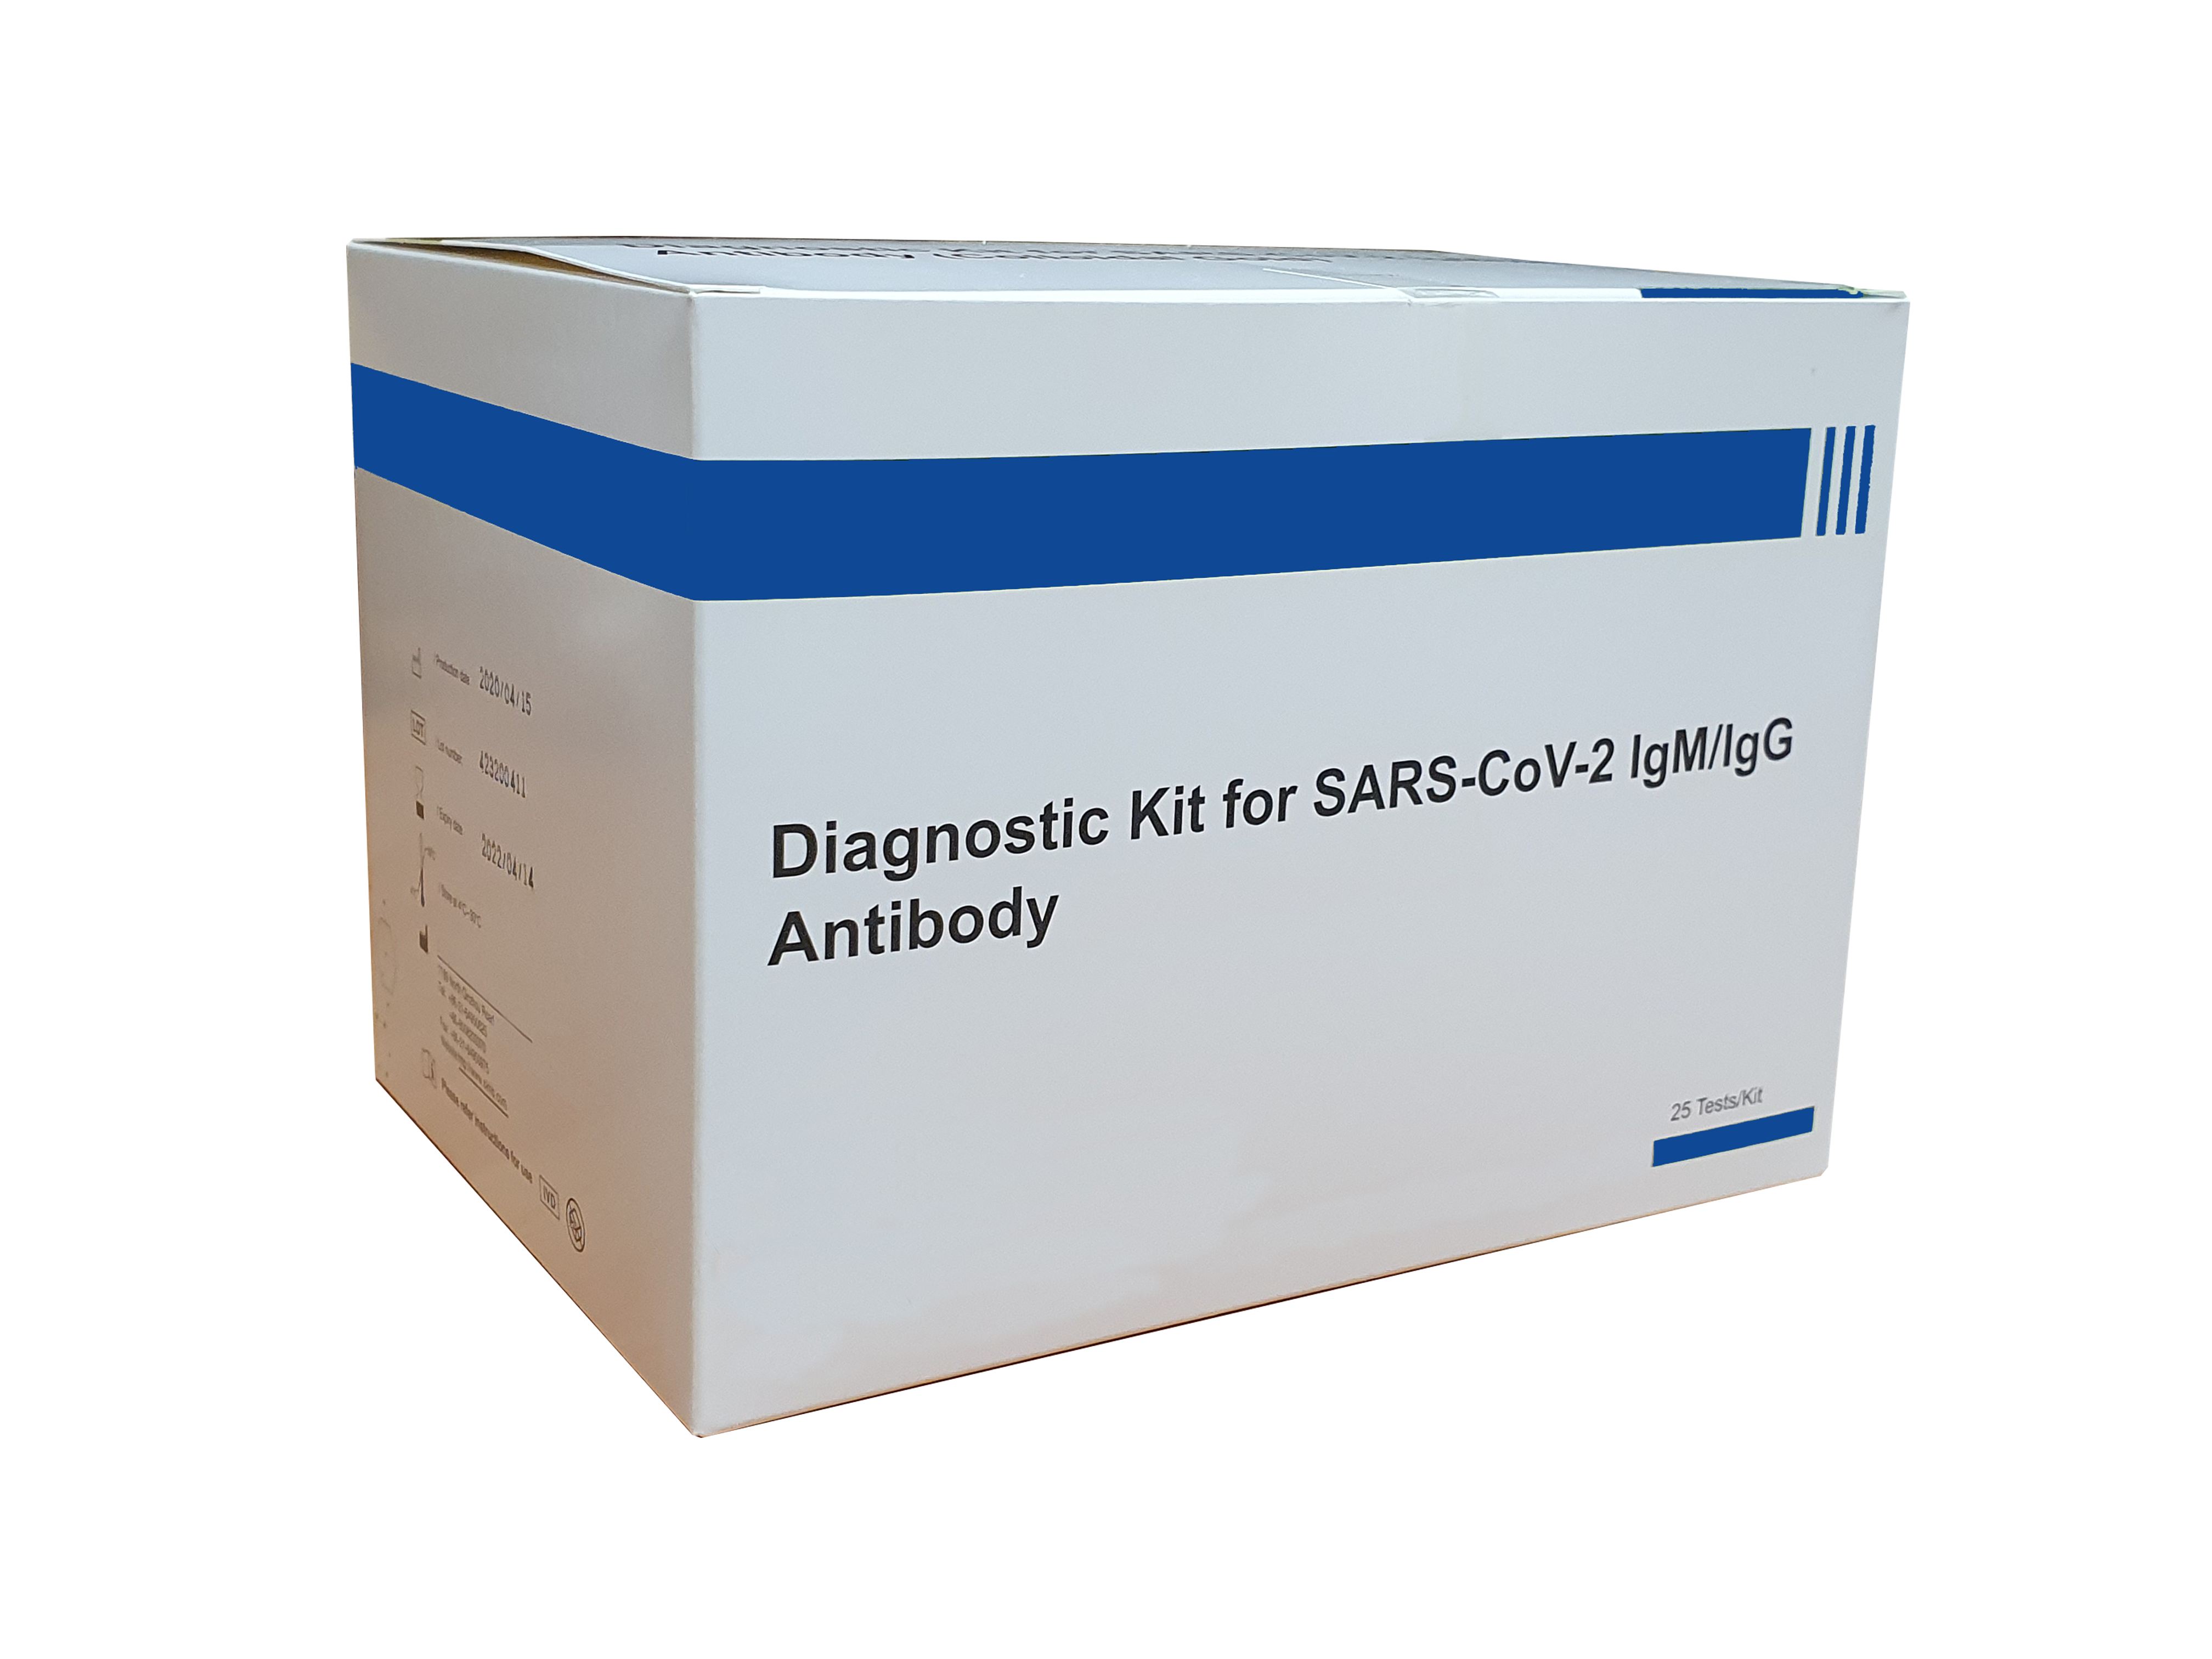 foto kit test rapido sierologico covid-19